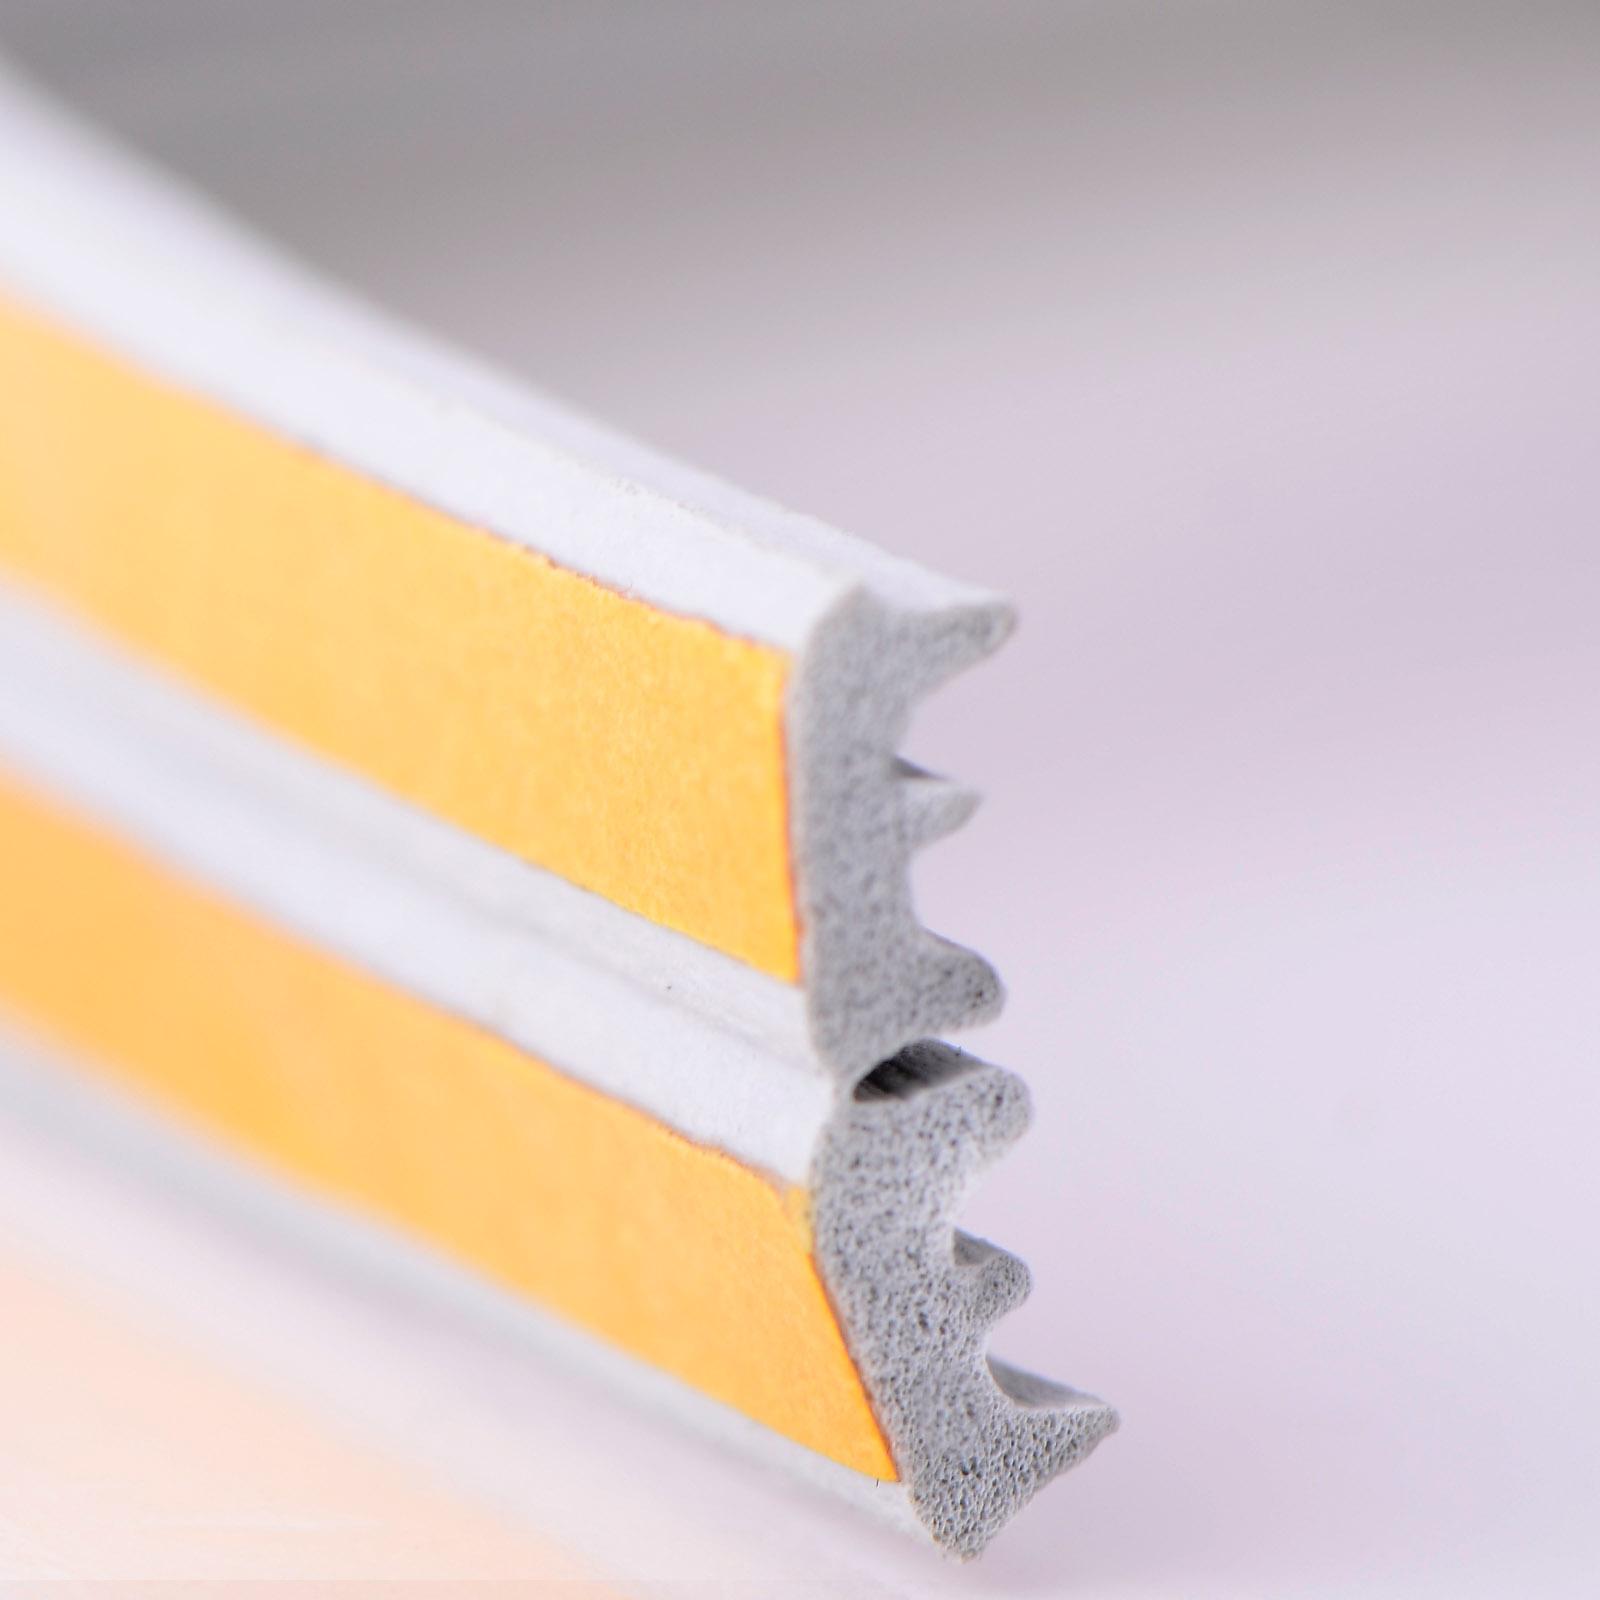 Shall agree Insulation foam strip you